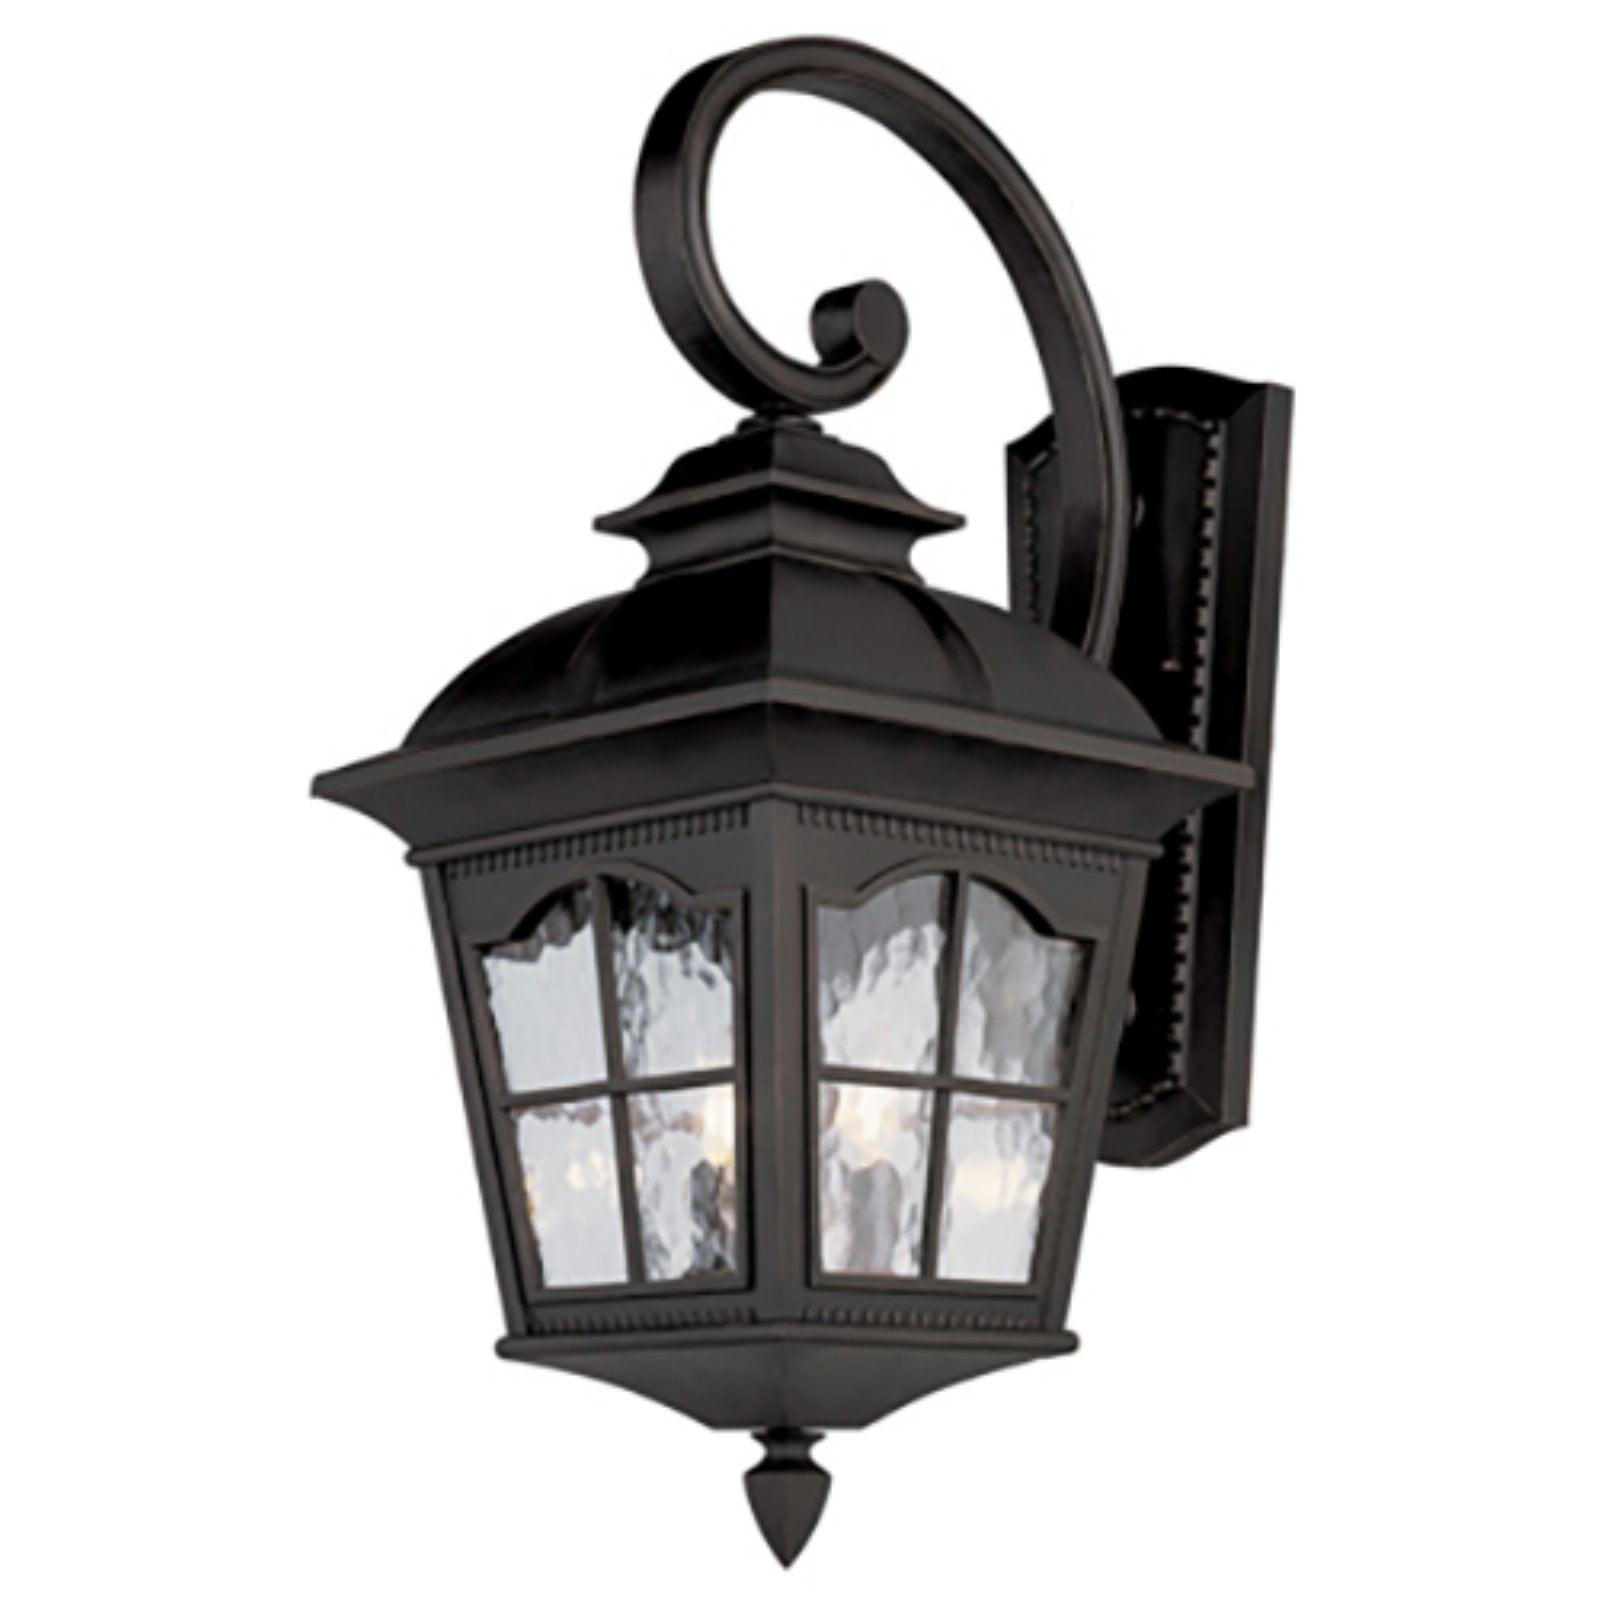 Trans Globe Lighting Briarwood 5429 BK Outdoor Wall Lantern